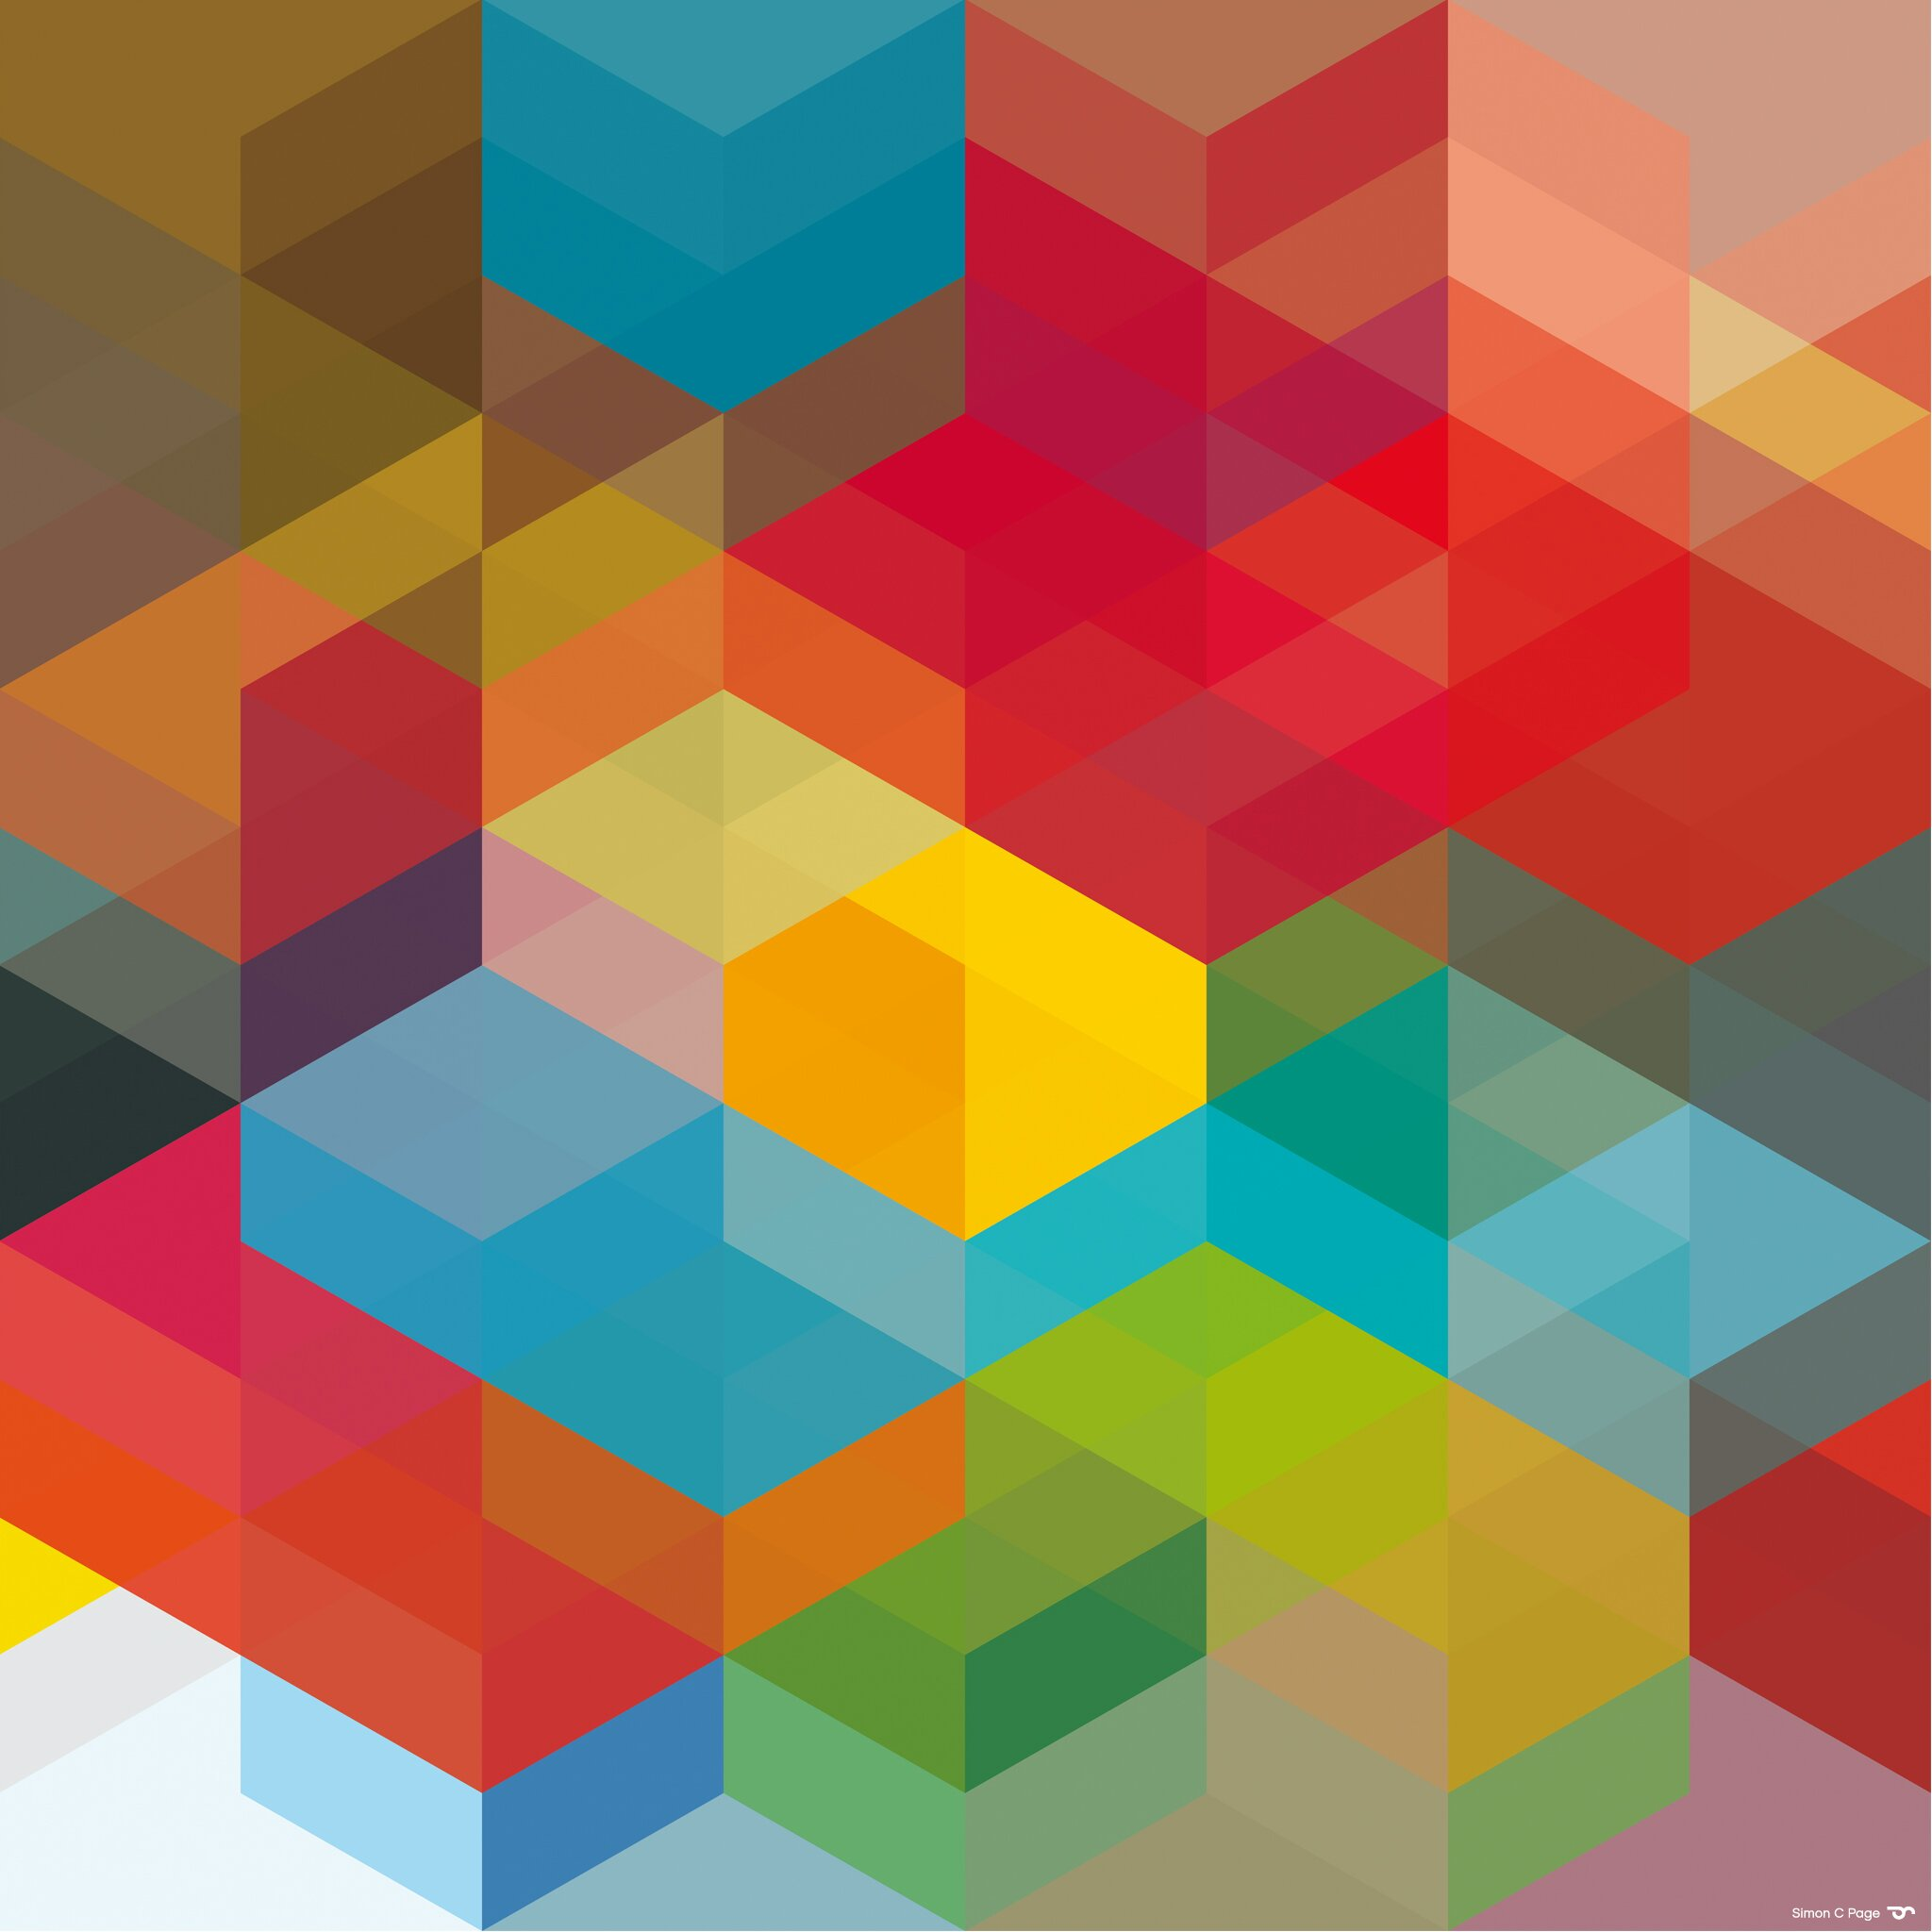 radiohead hd phone wallpaper